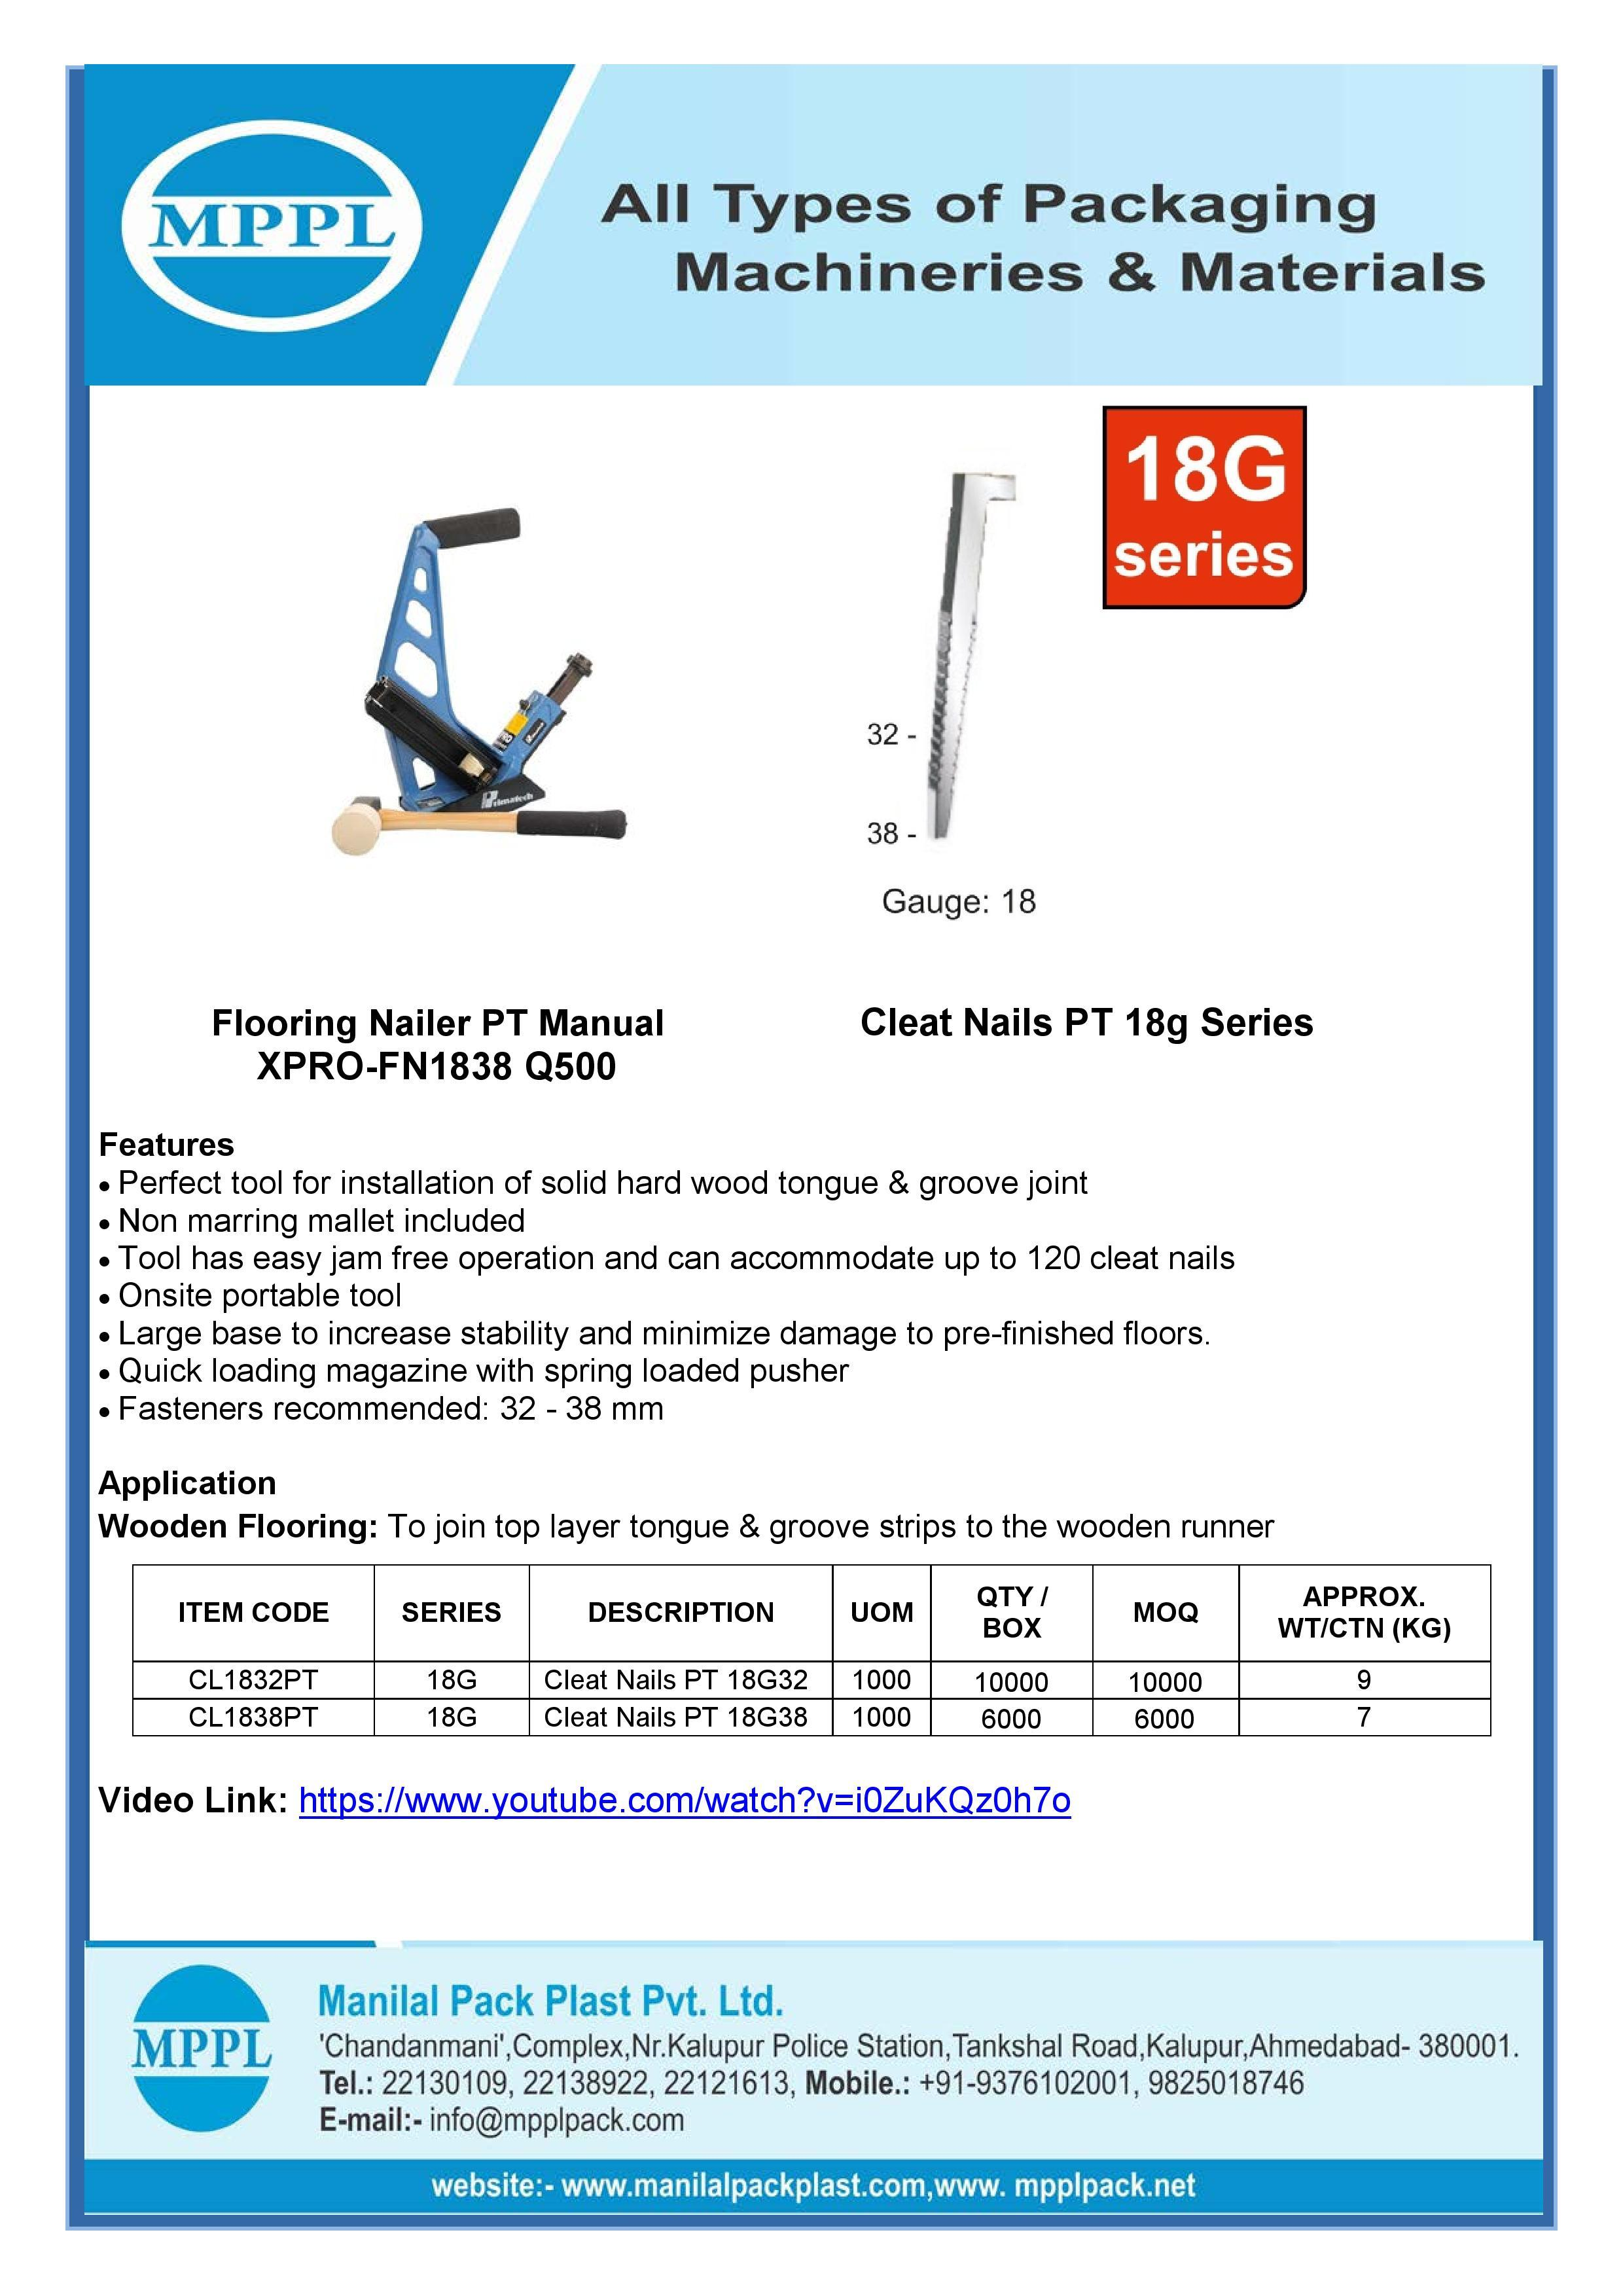 Flooring Nailer PT Manual XPRO-FN1838 Q500